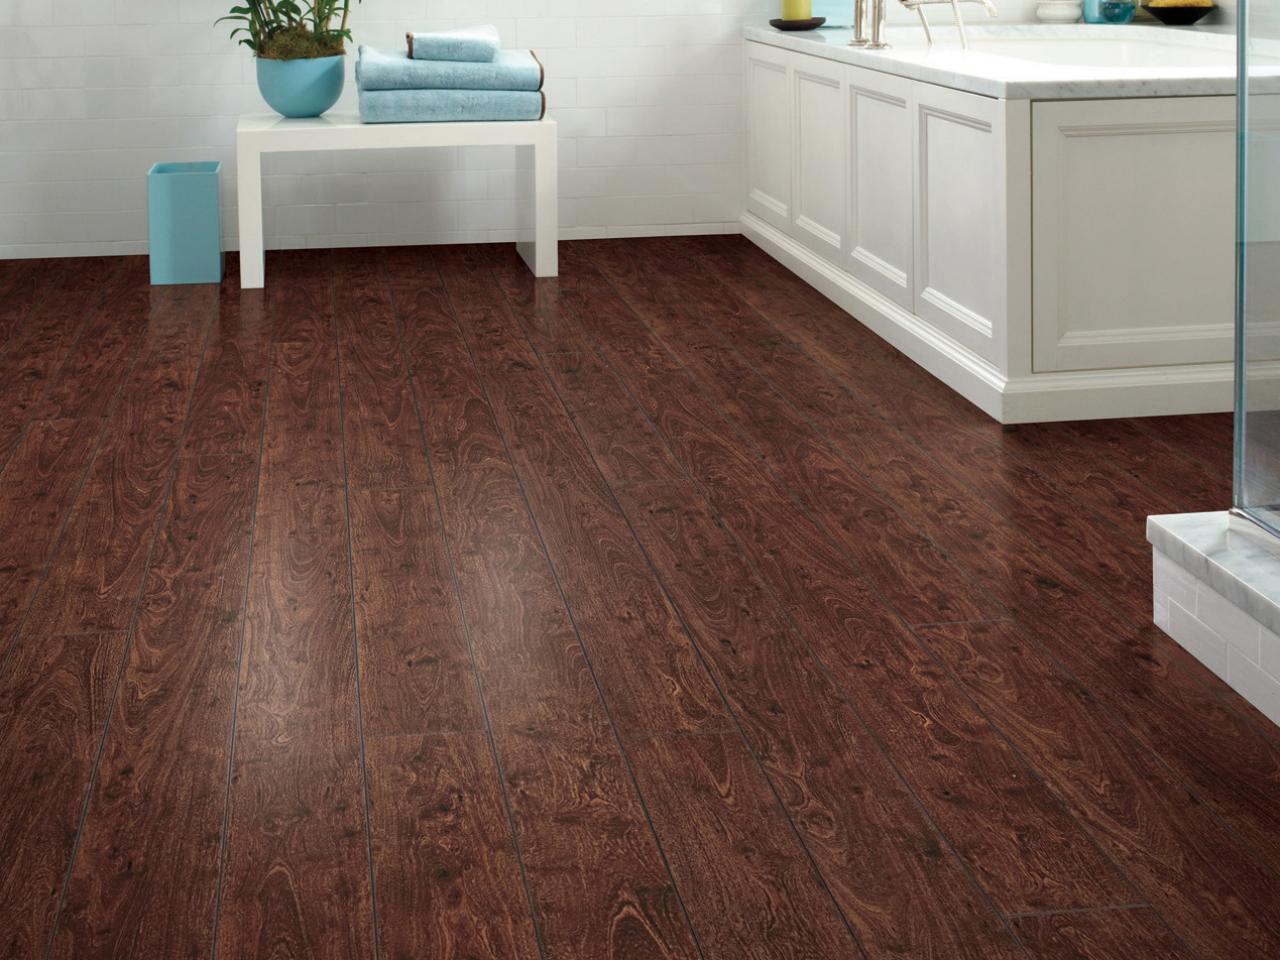 laminate wood flooring ideas laminate flooring for basements XFKTRDF